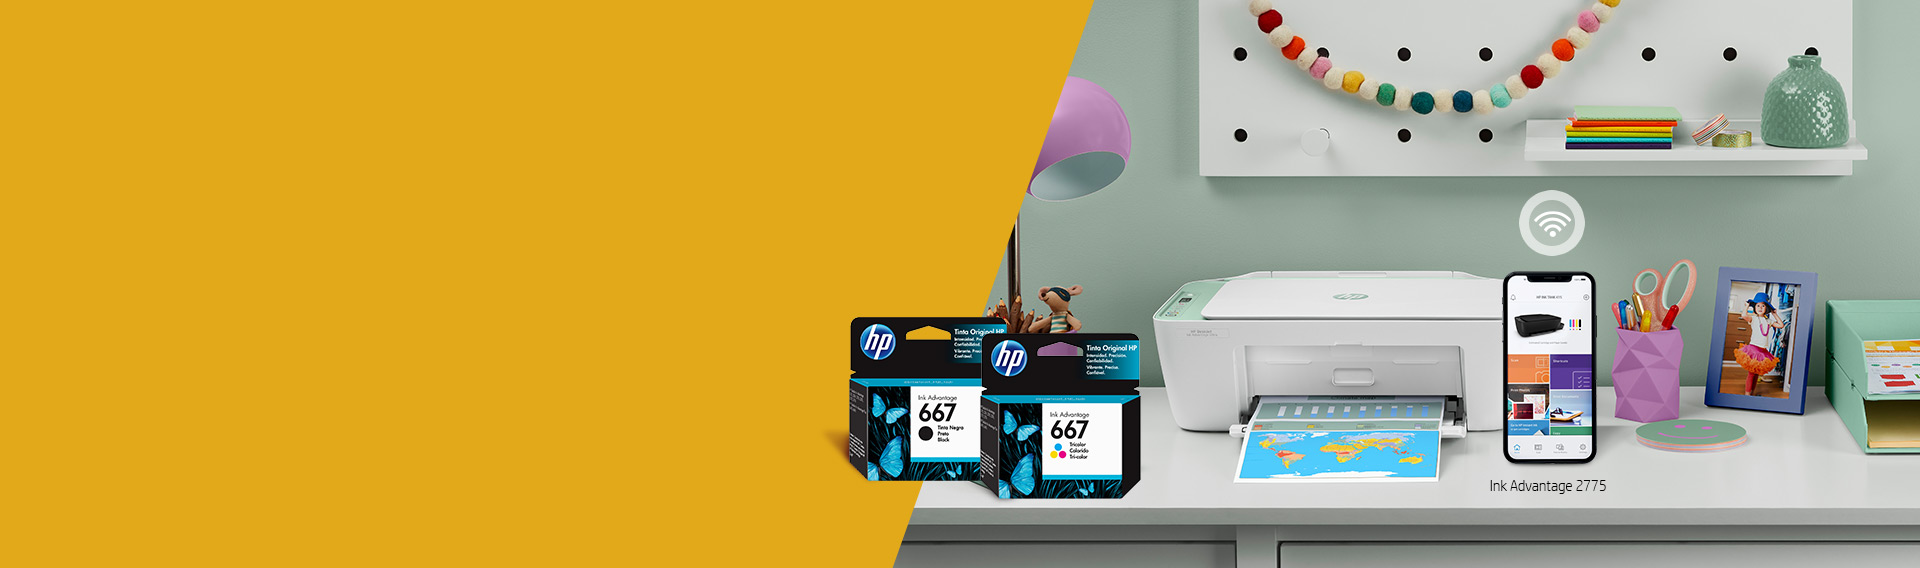 HP INK ADVANTAGE ¡Conectate e imprimí!